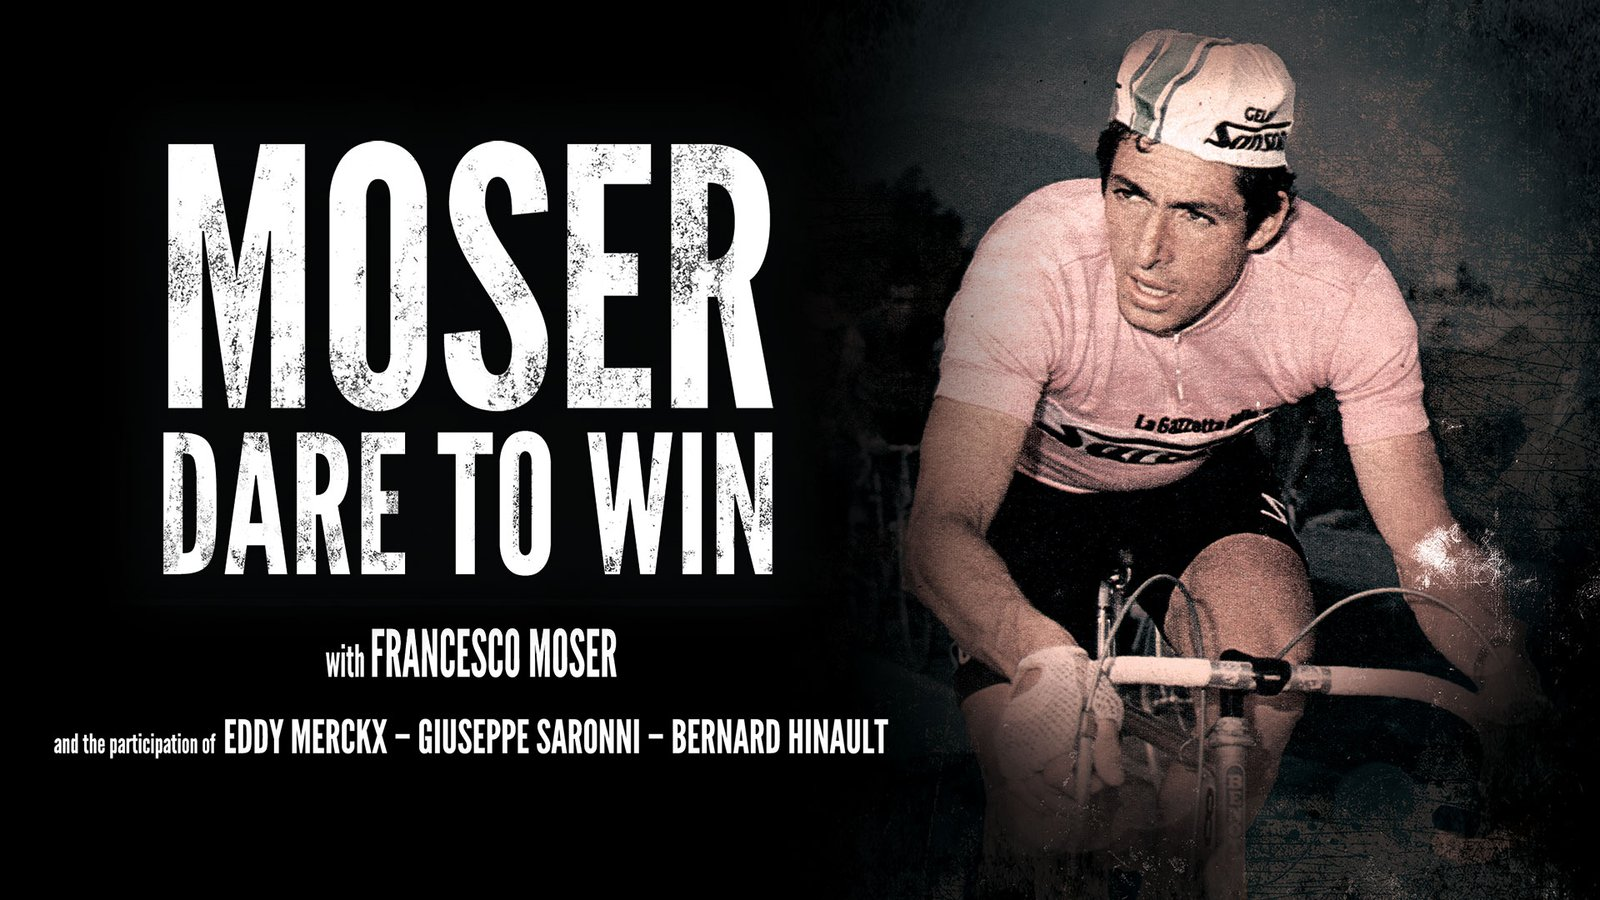 Moser: Dare to Win - The Career of Italian Cyclist Francesco Moser